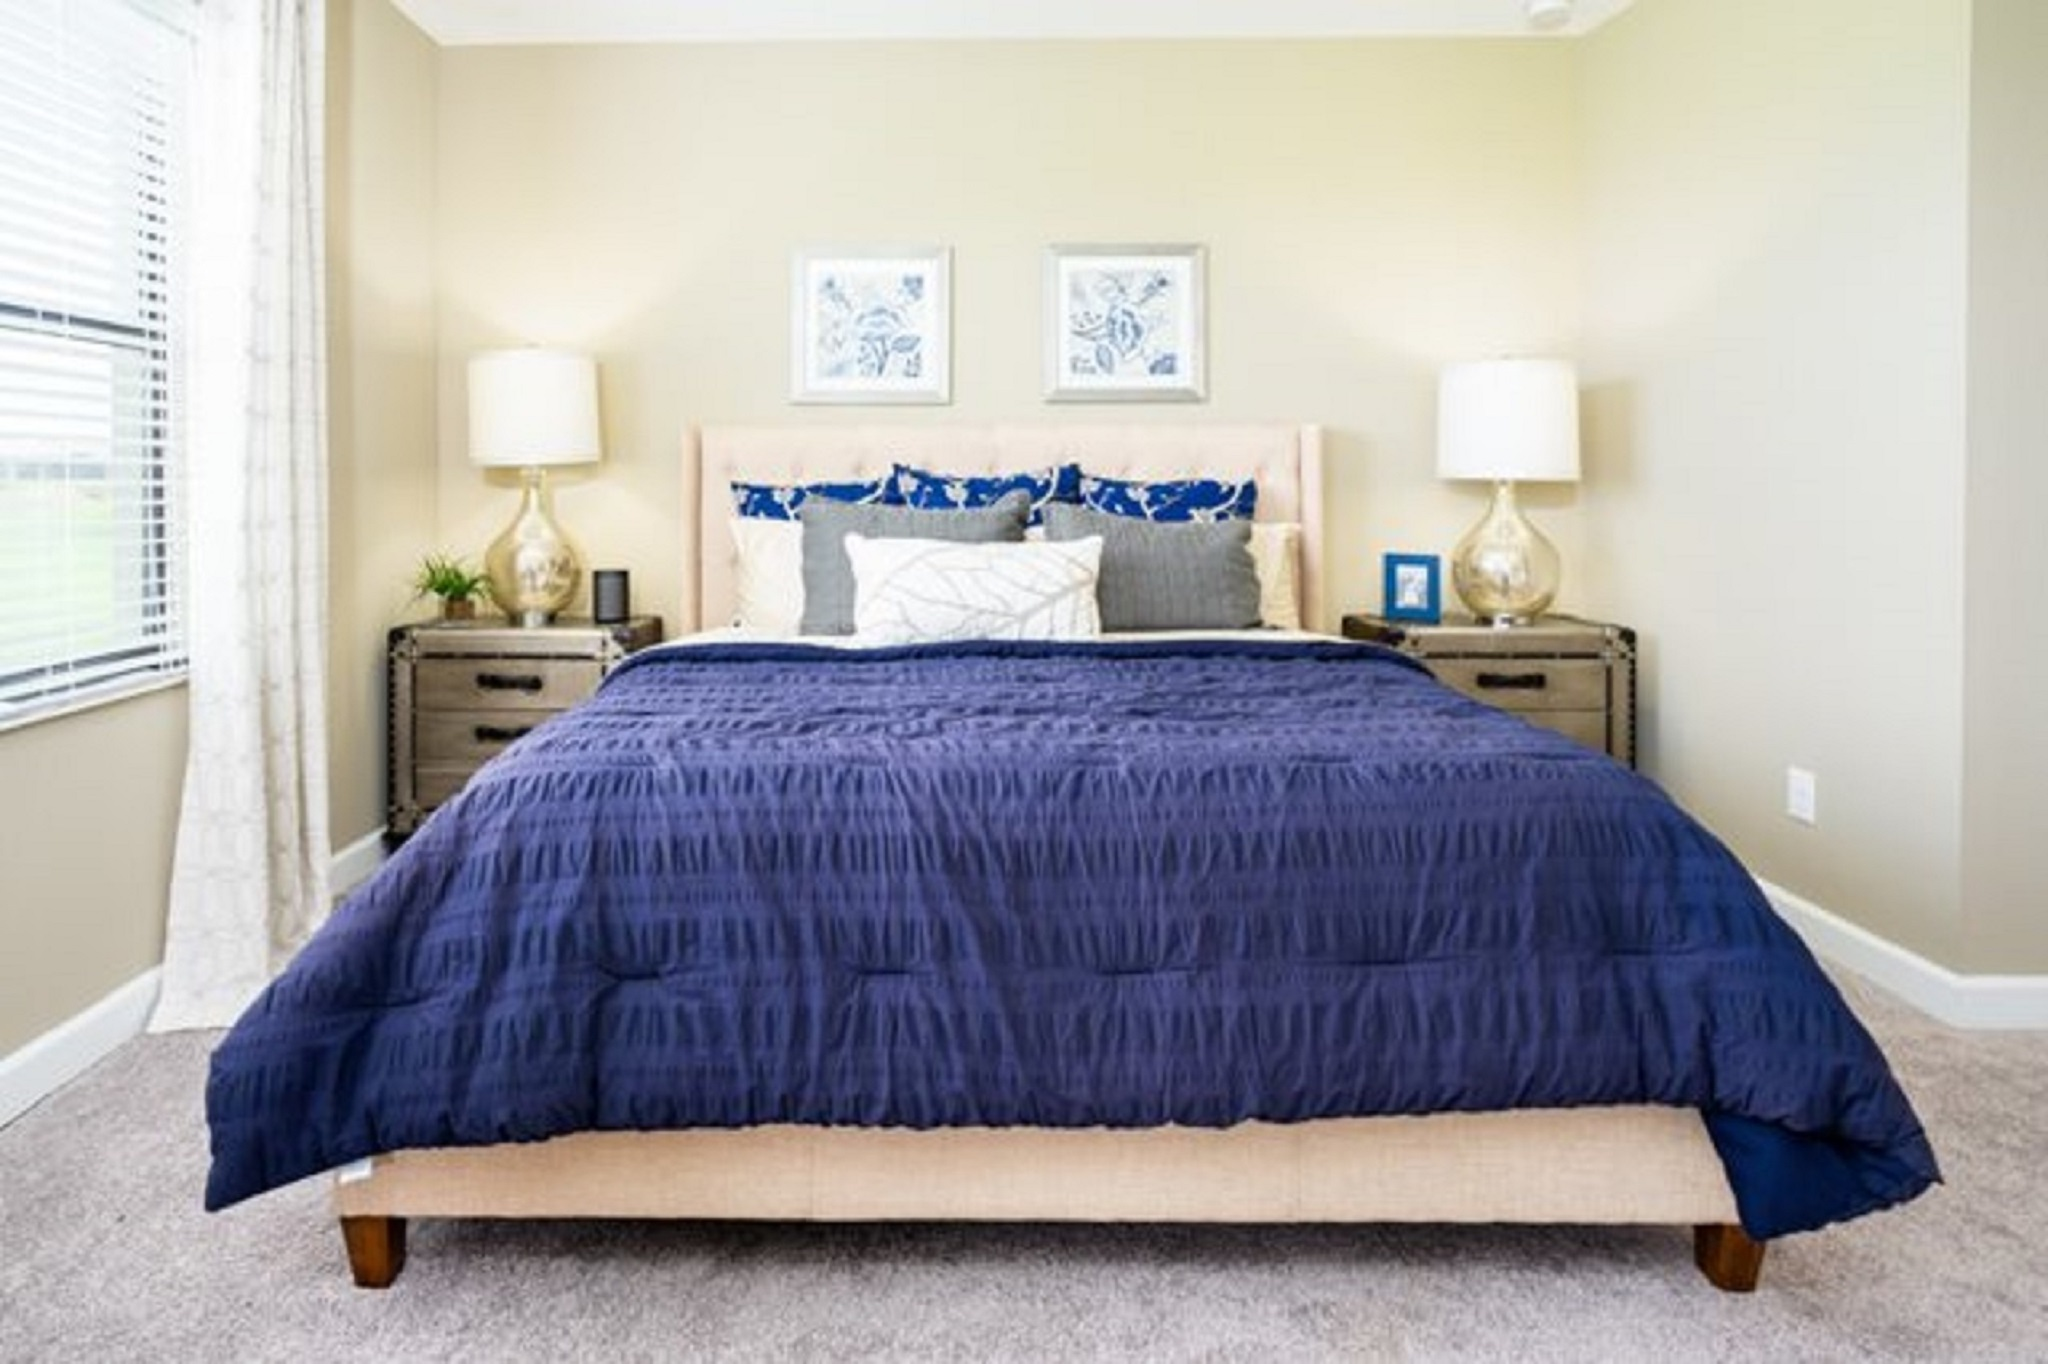 Modern 3 Bedroom Condo At Champions Gate, Orlando. photo 24737670